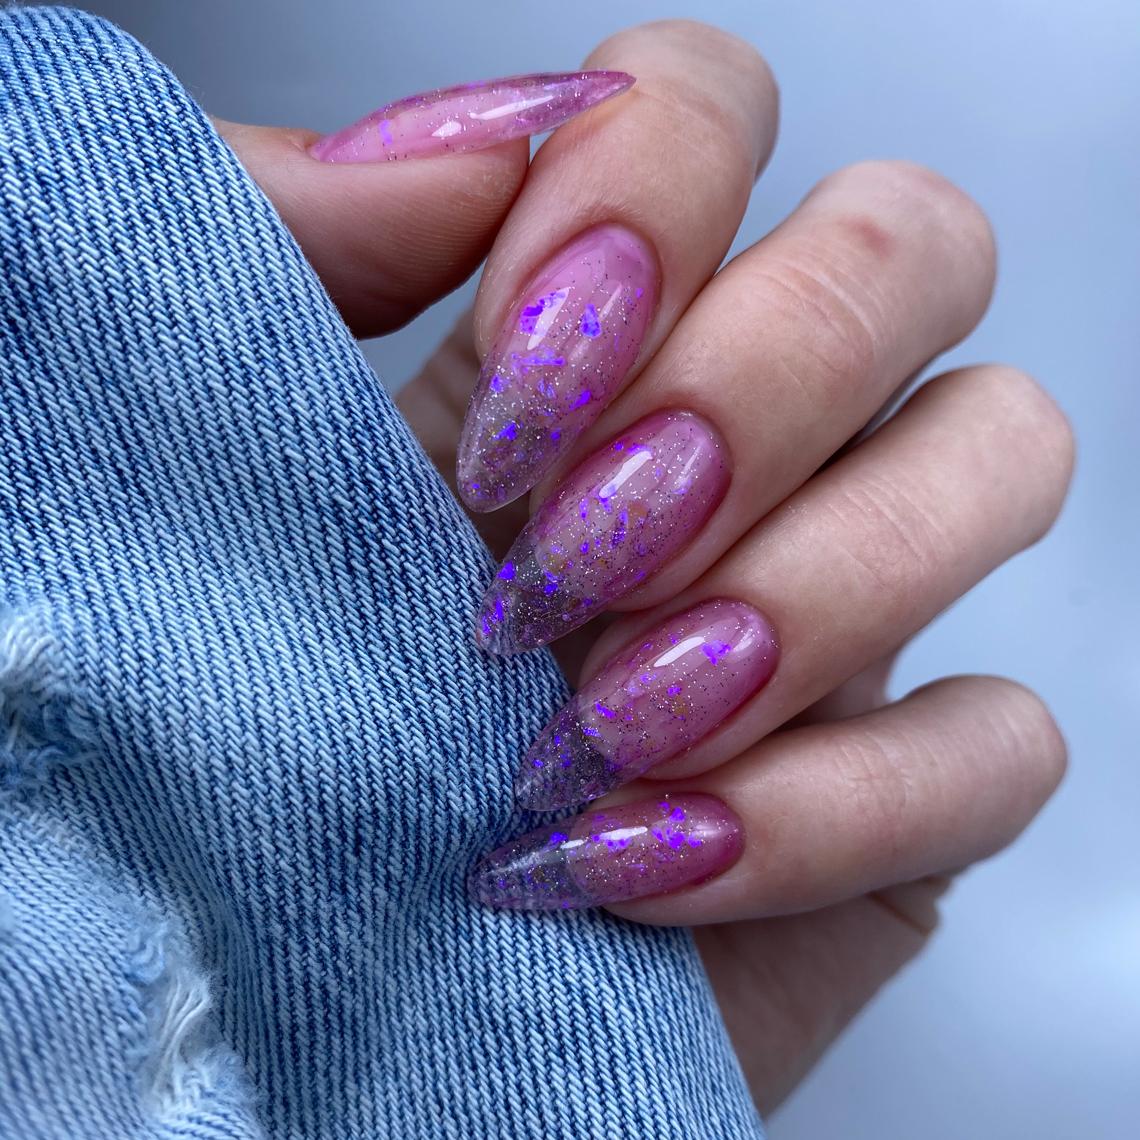 Builder Clear | Snowflakes 2 Violet Sparkle - Folia Cięta | Efekt Holo | Tip Top Top Coat | Eureka! Gel Polish